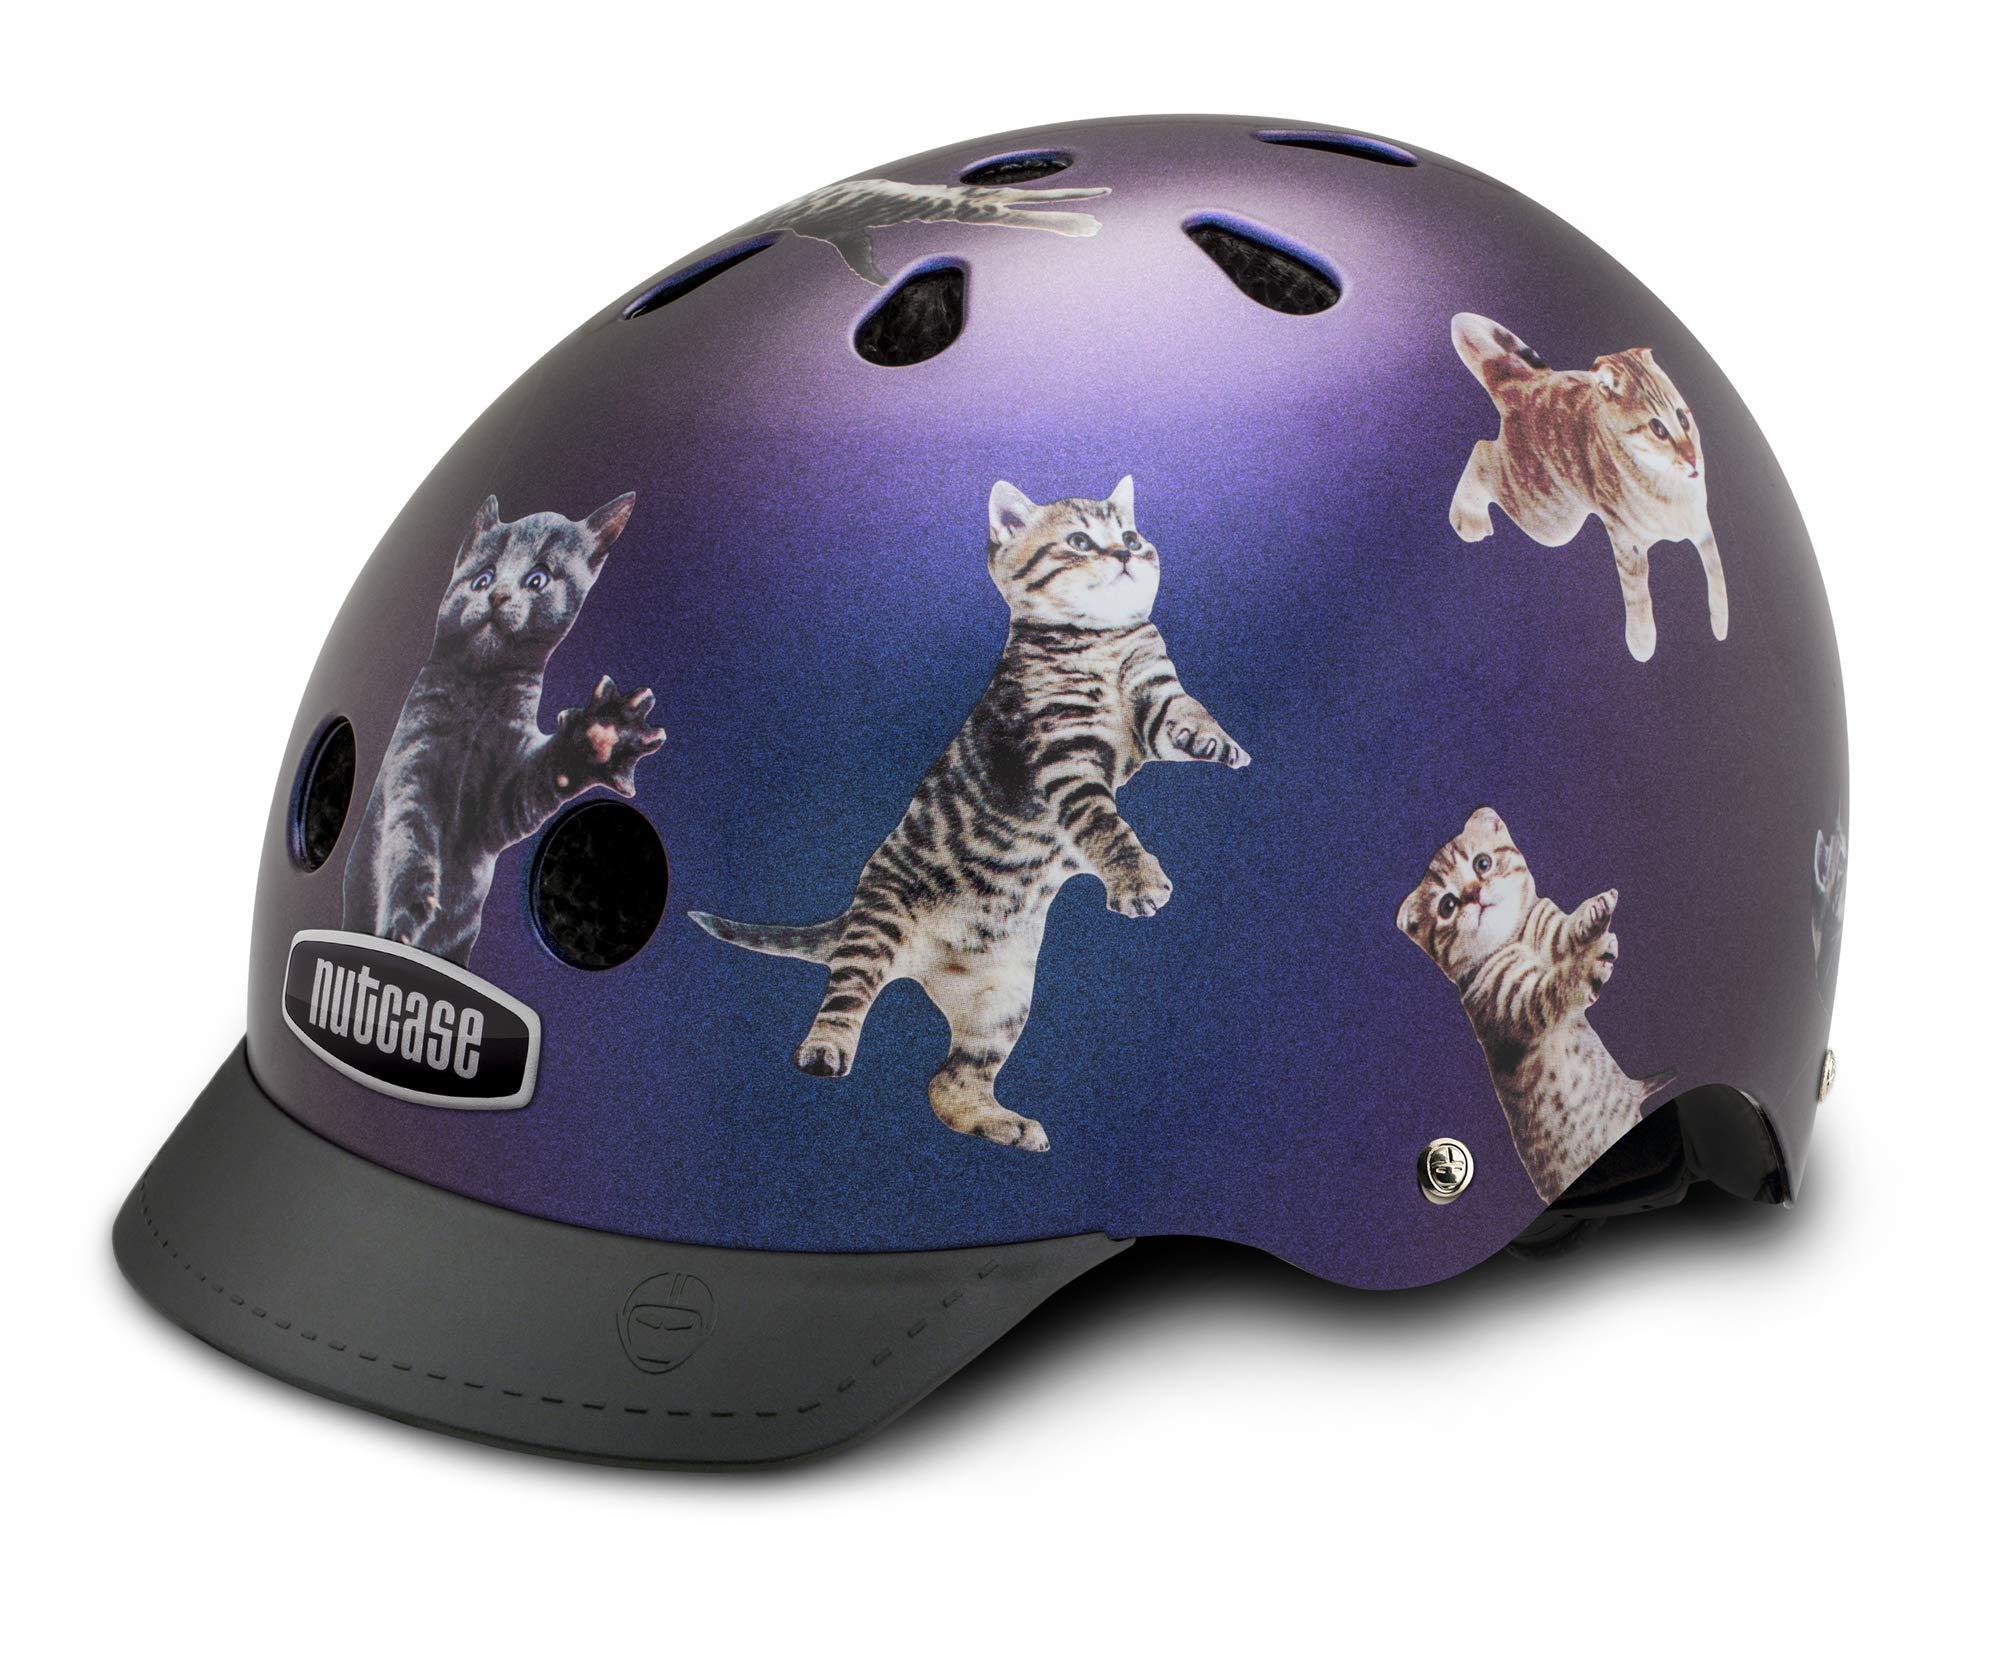 Nutcase - Patterned Street Bike Helmet for Adults, Space Cats, Medium